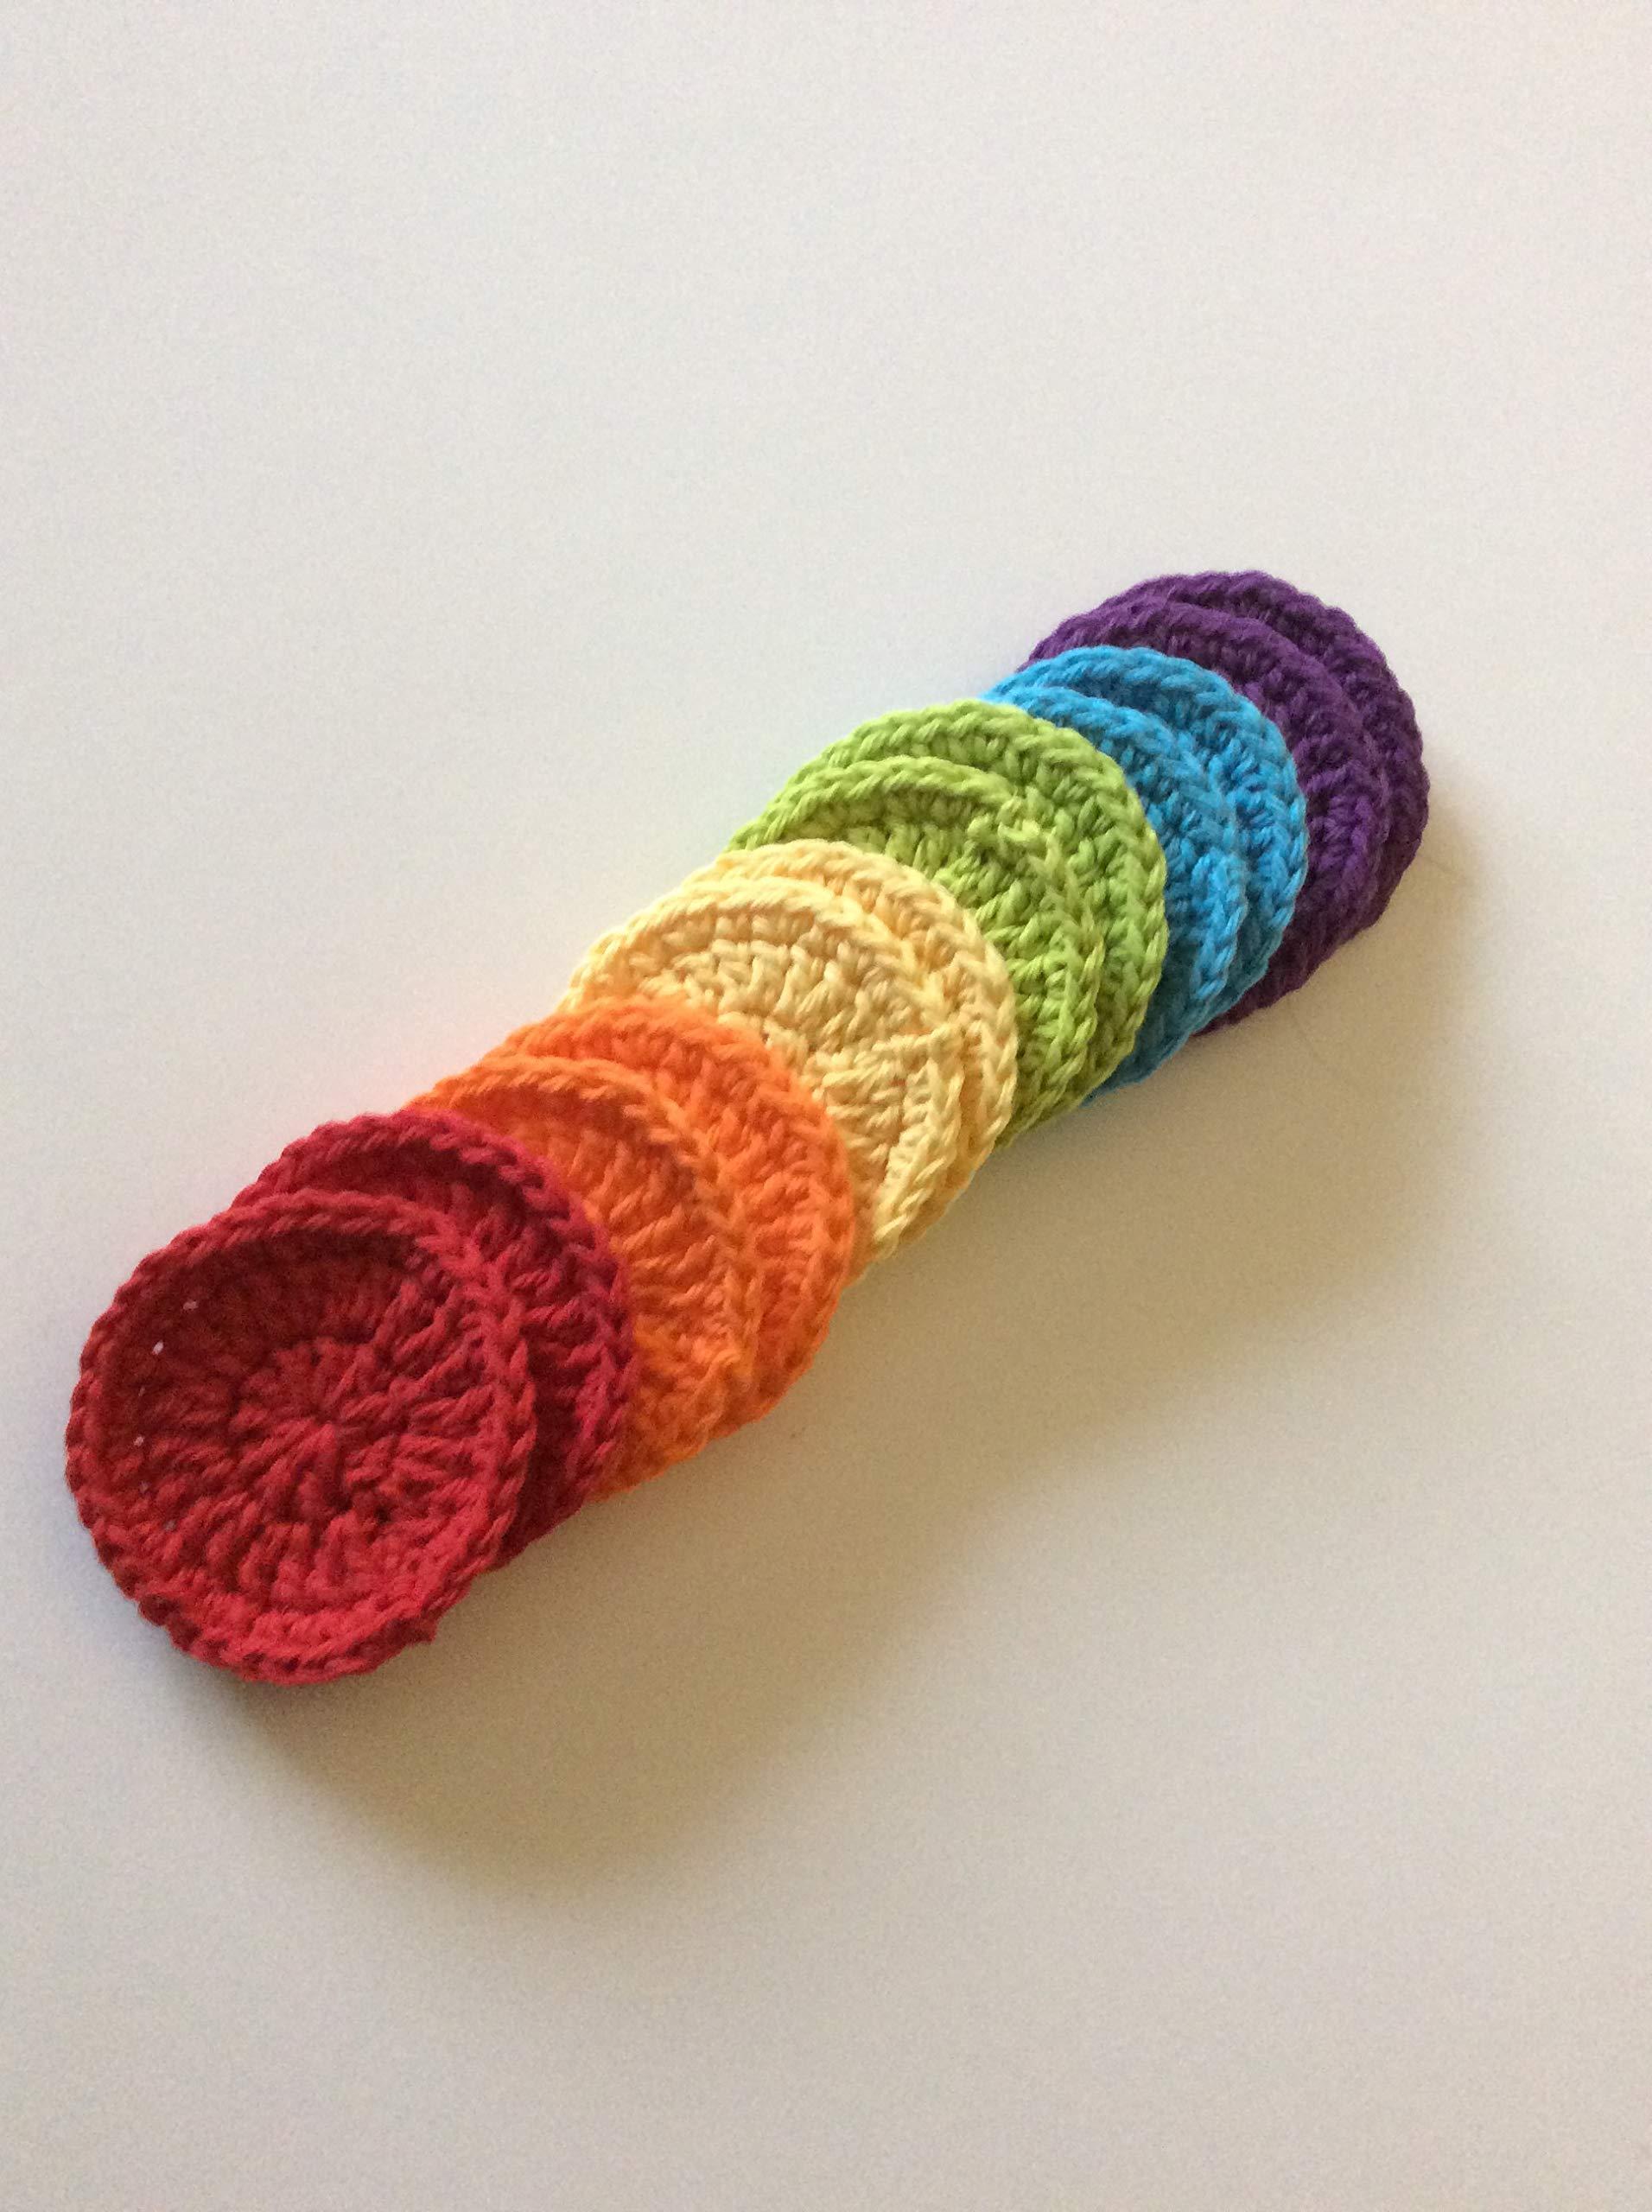 Crochet Round Scrubbies Only New Crochet Patterns